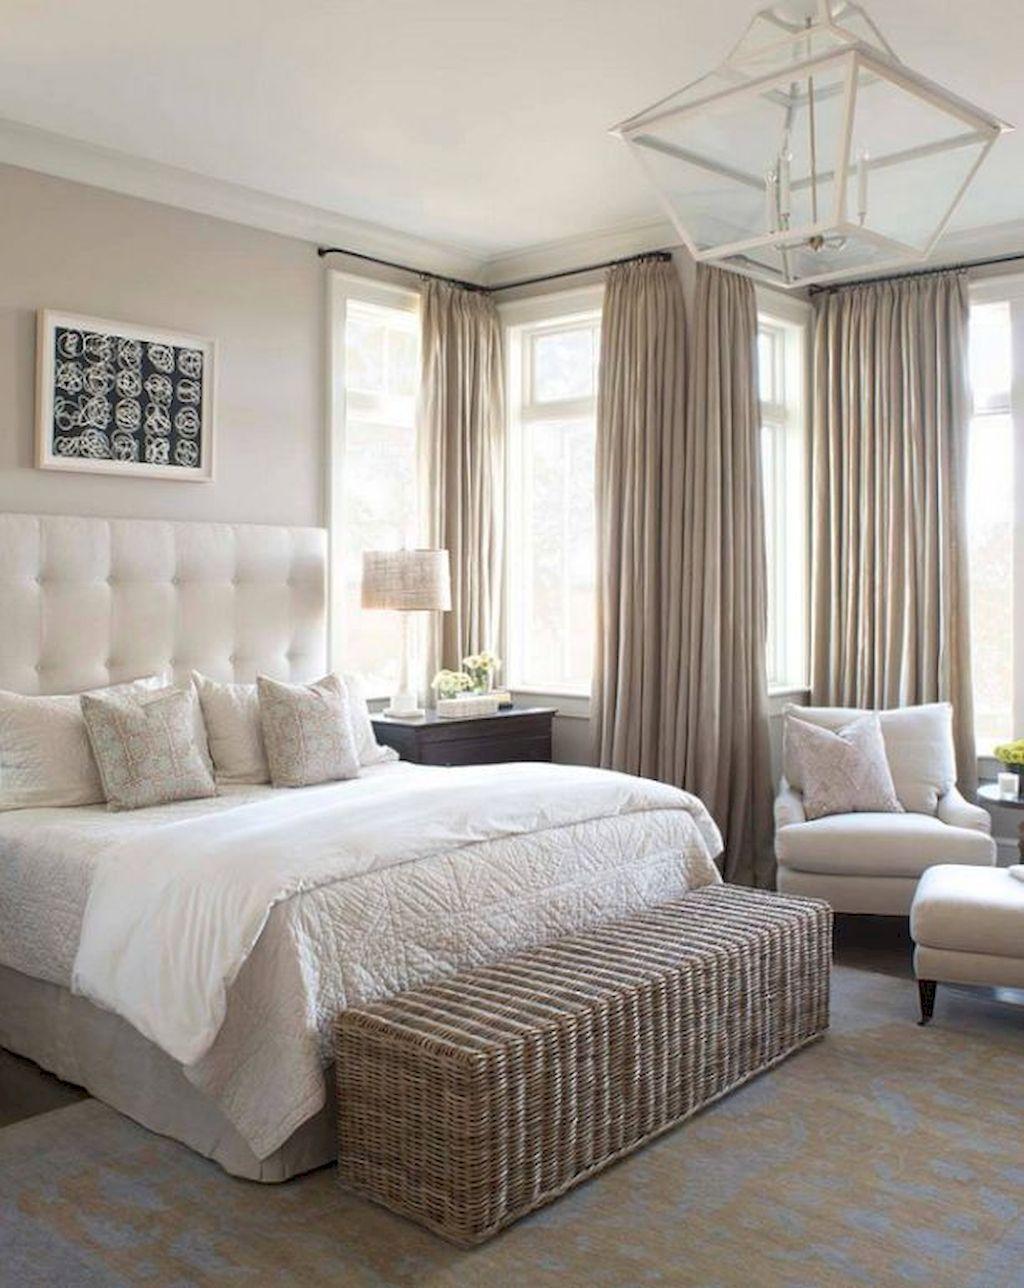 75 Gorgeous Master Bedroom Design Ideas 75